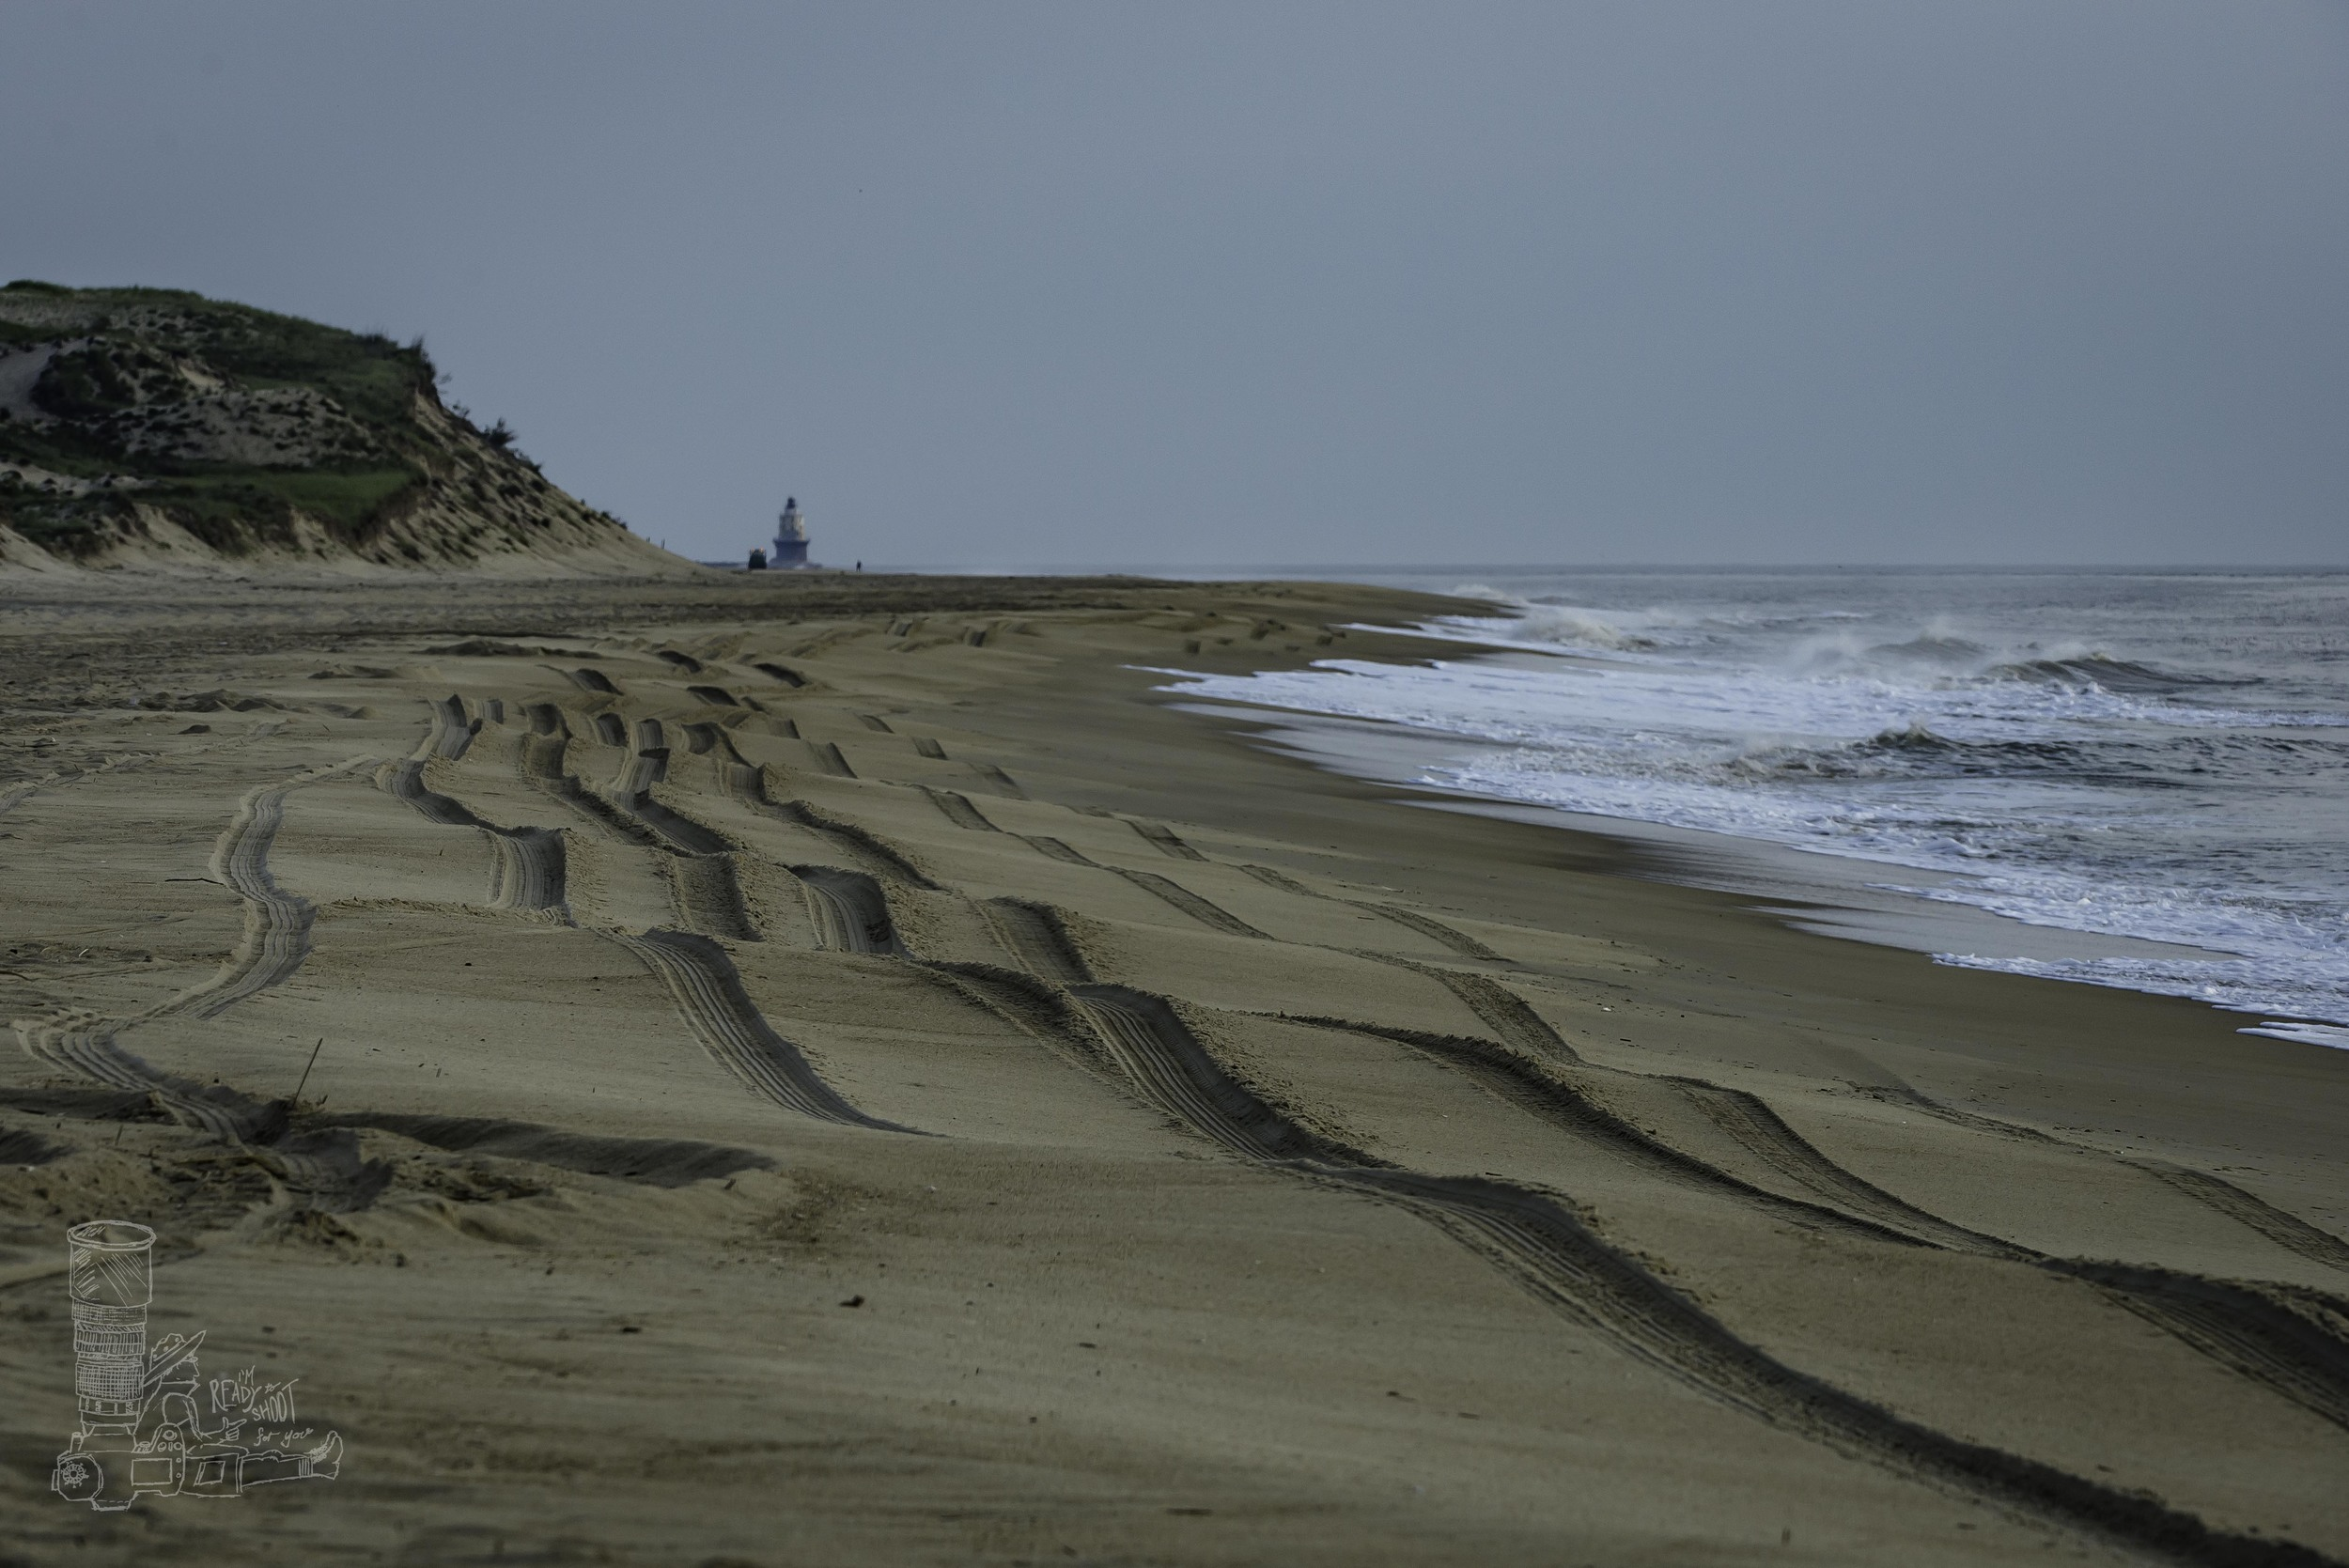 Footprints?